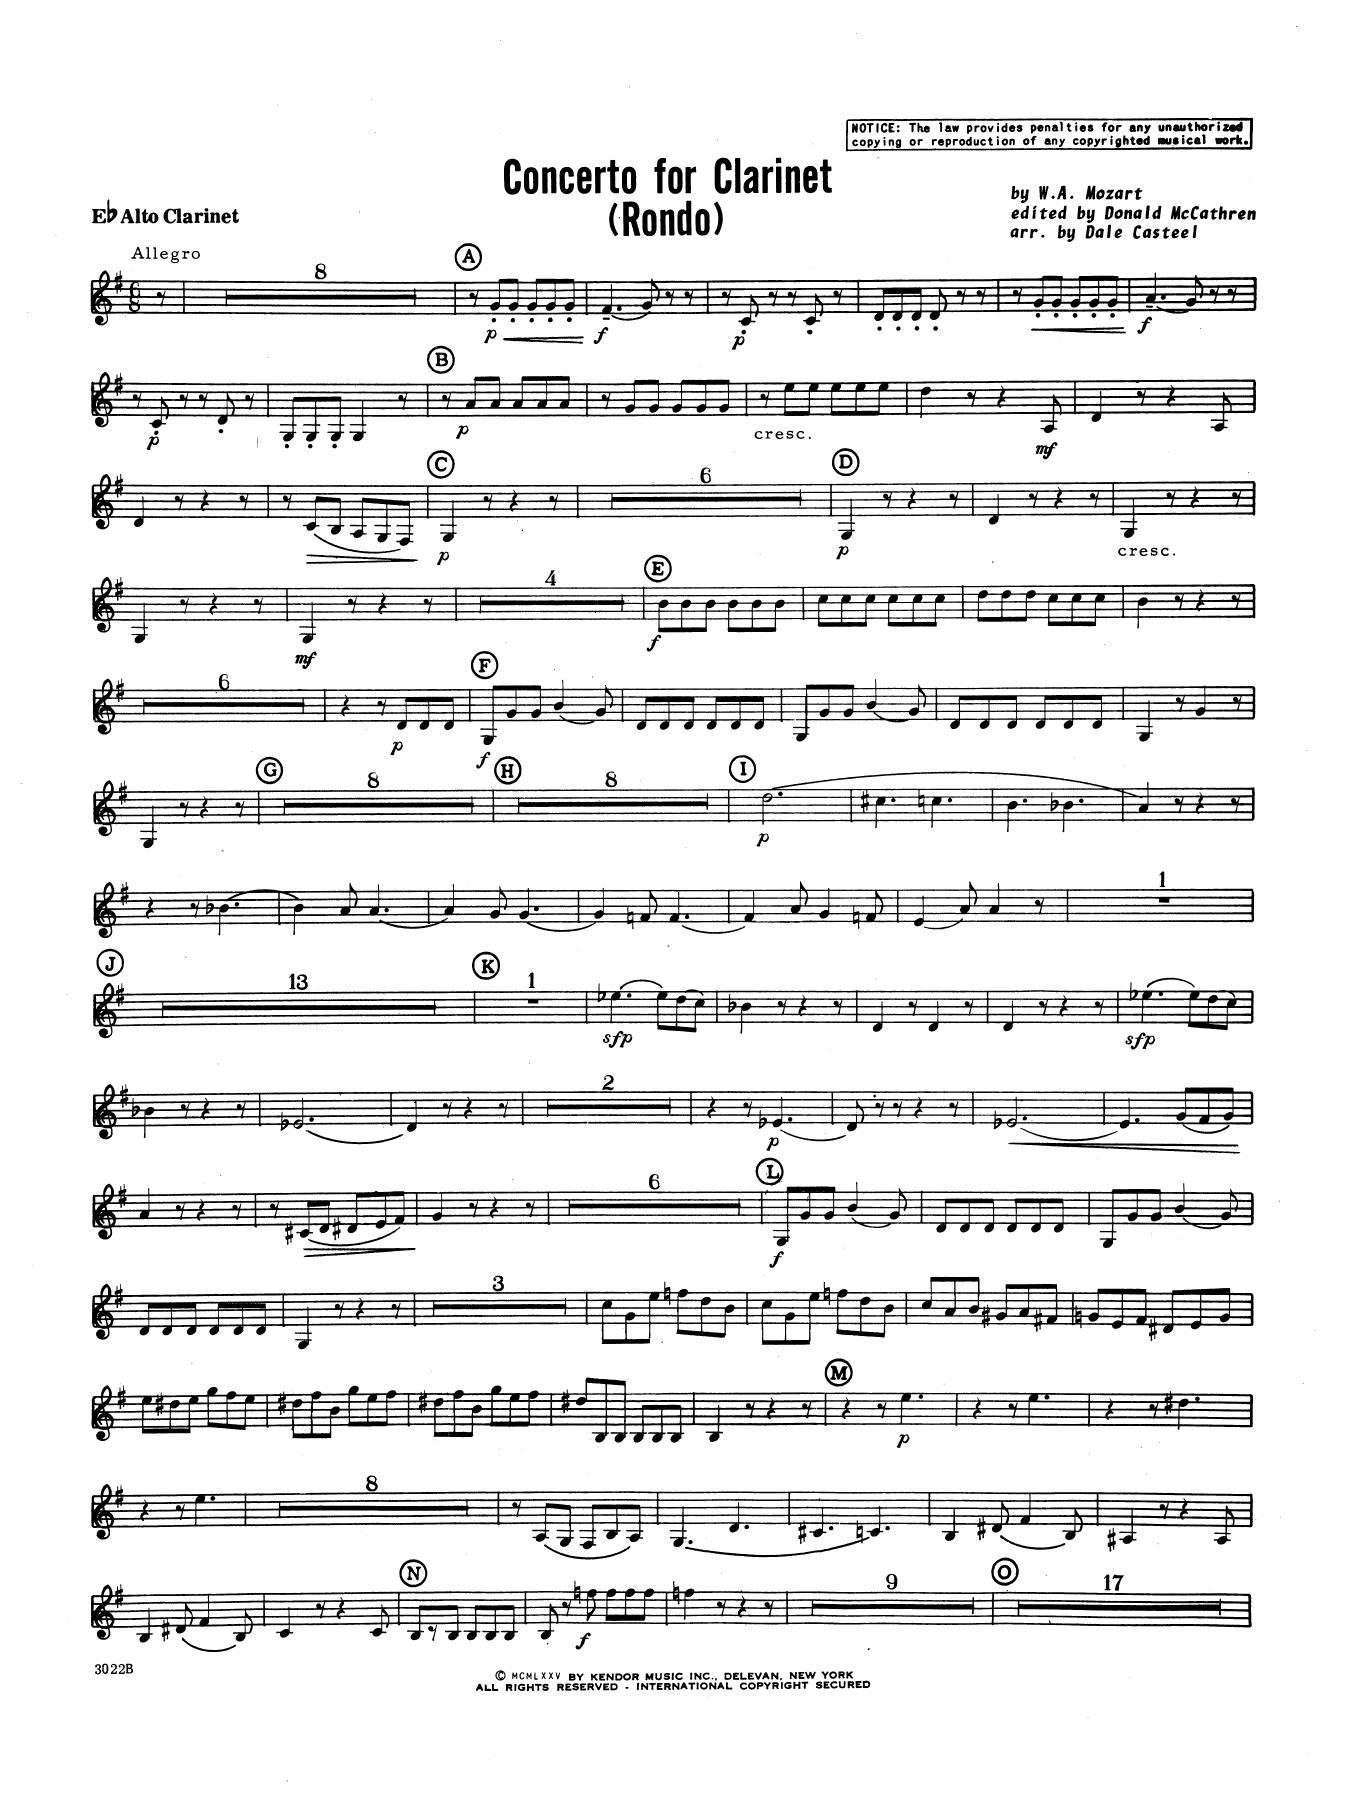 Donald McCathren and Dale Casteel Concerto For Clarinet - Rondo (3rd Movement) - K.622 - Eb Alto Clarinet sheet music notes printable PDF score